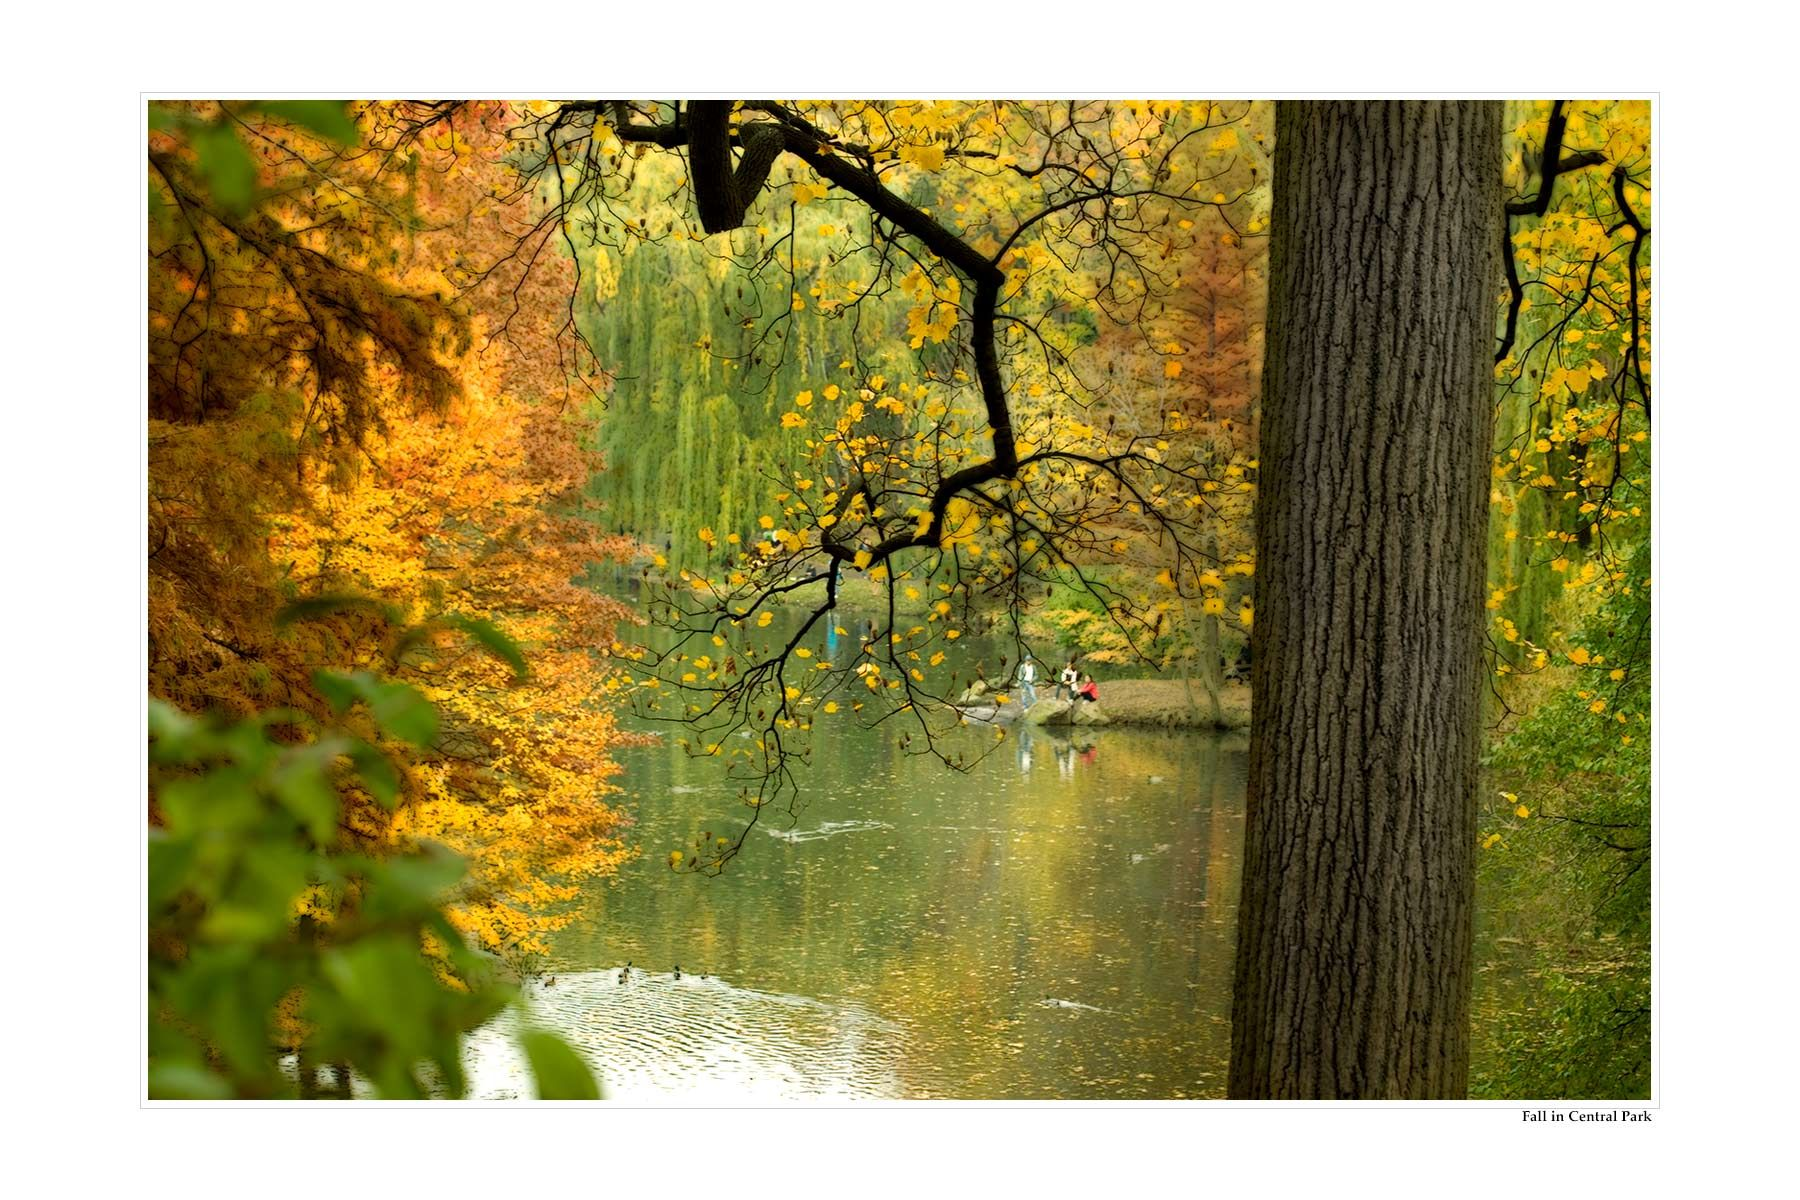 Fall-in-central-Park.jpg